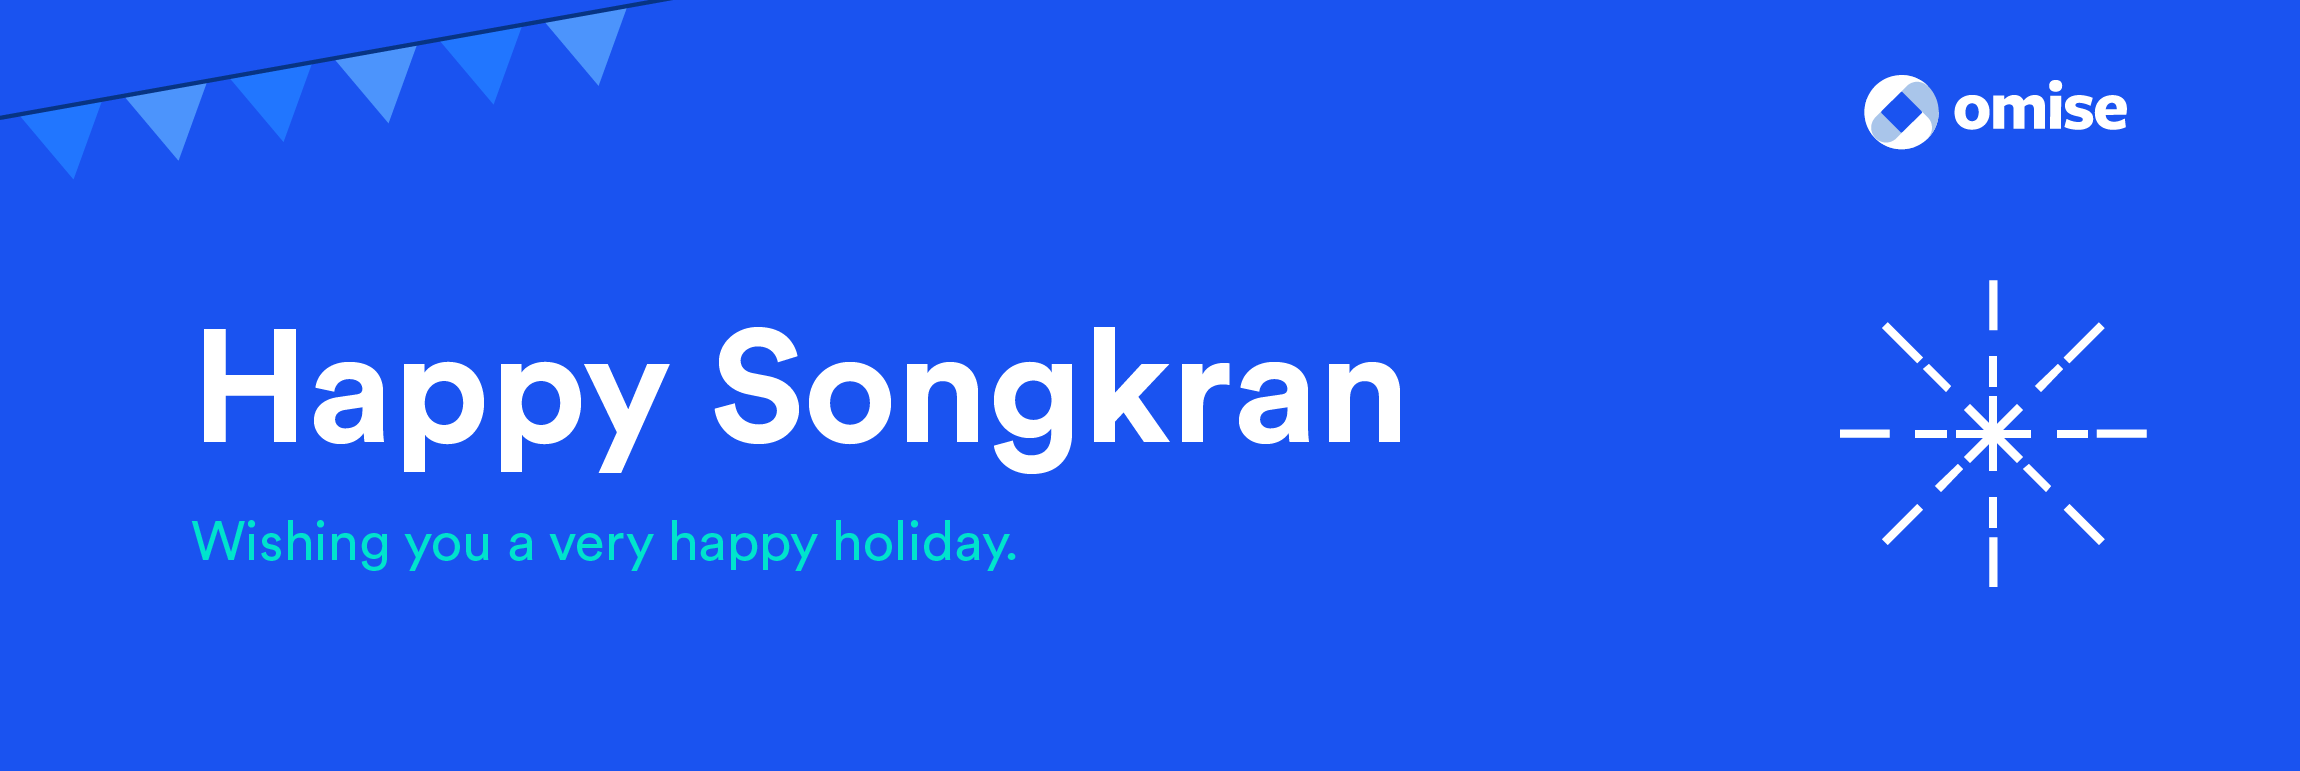 Songkran Banner